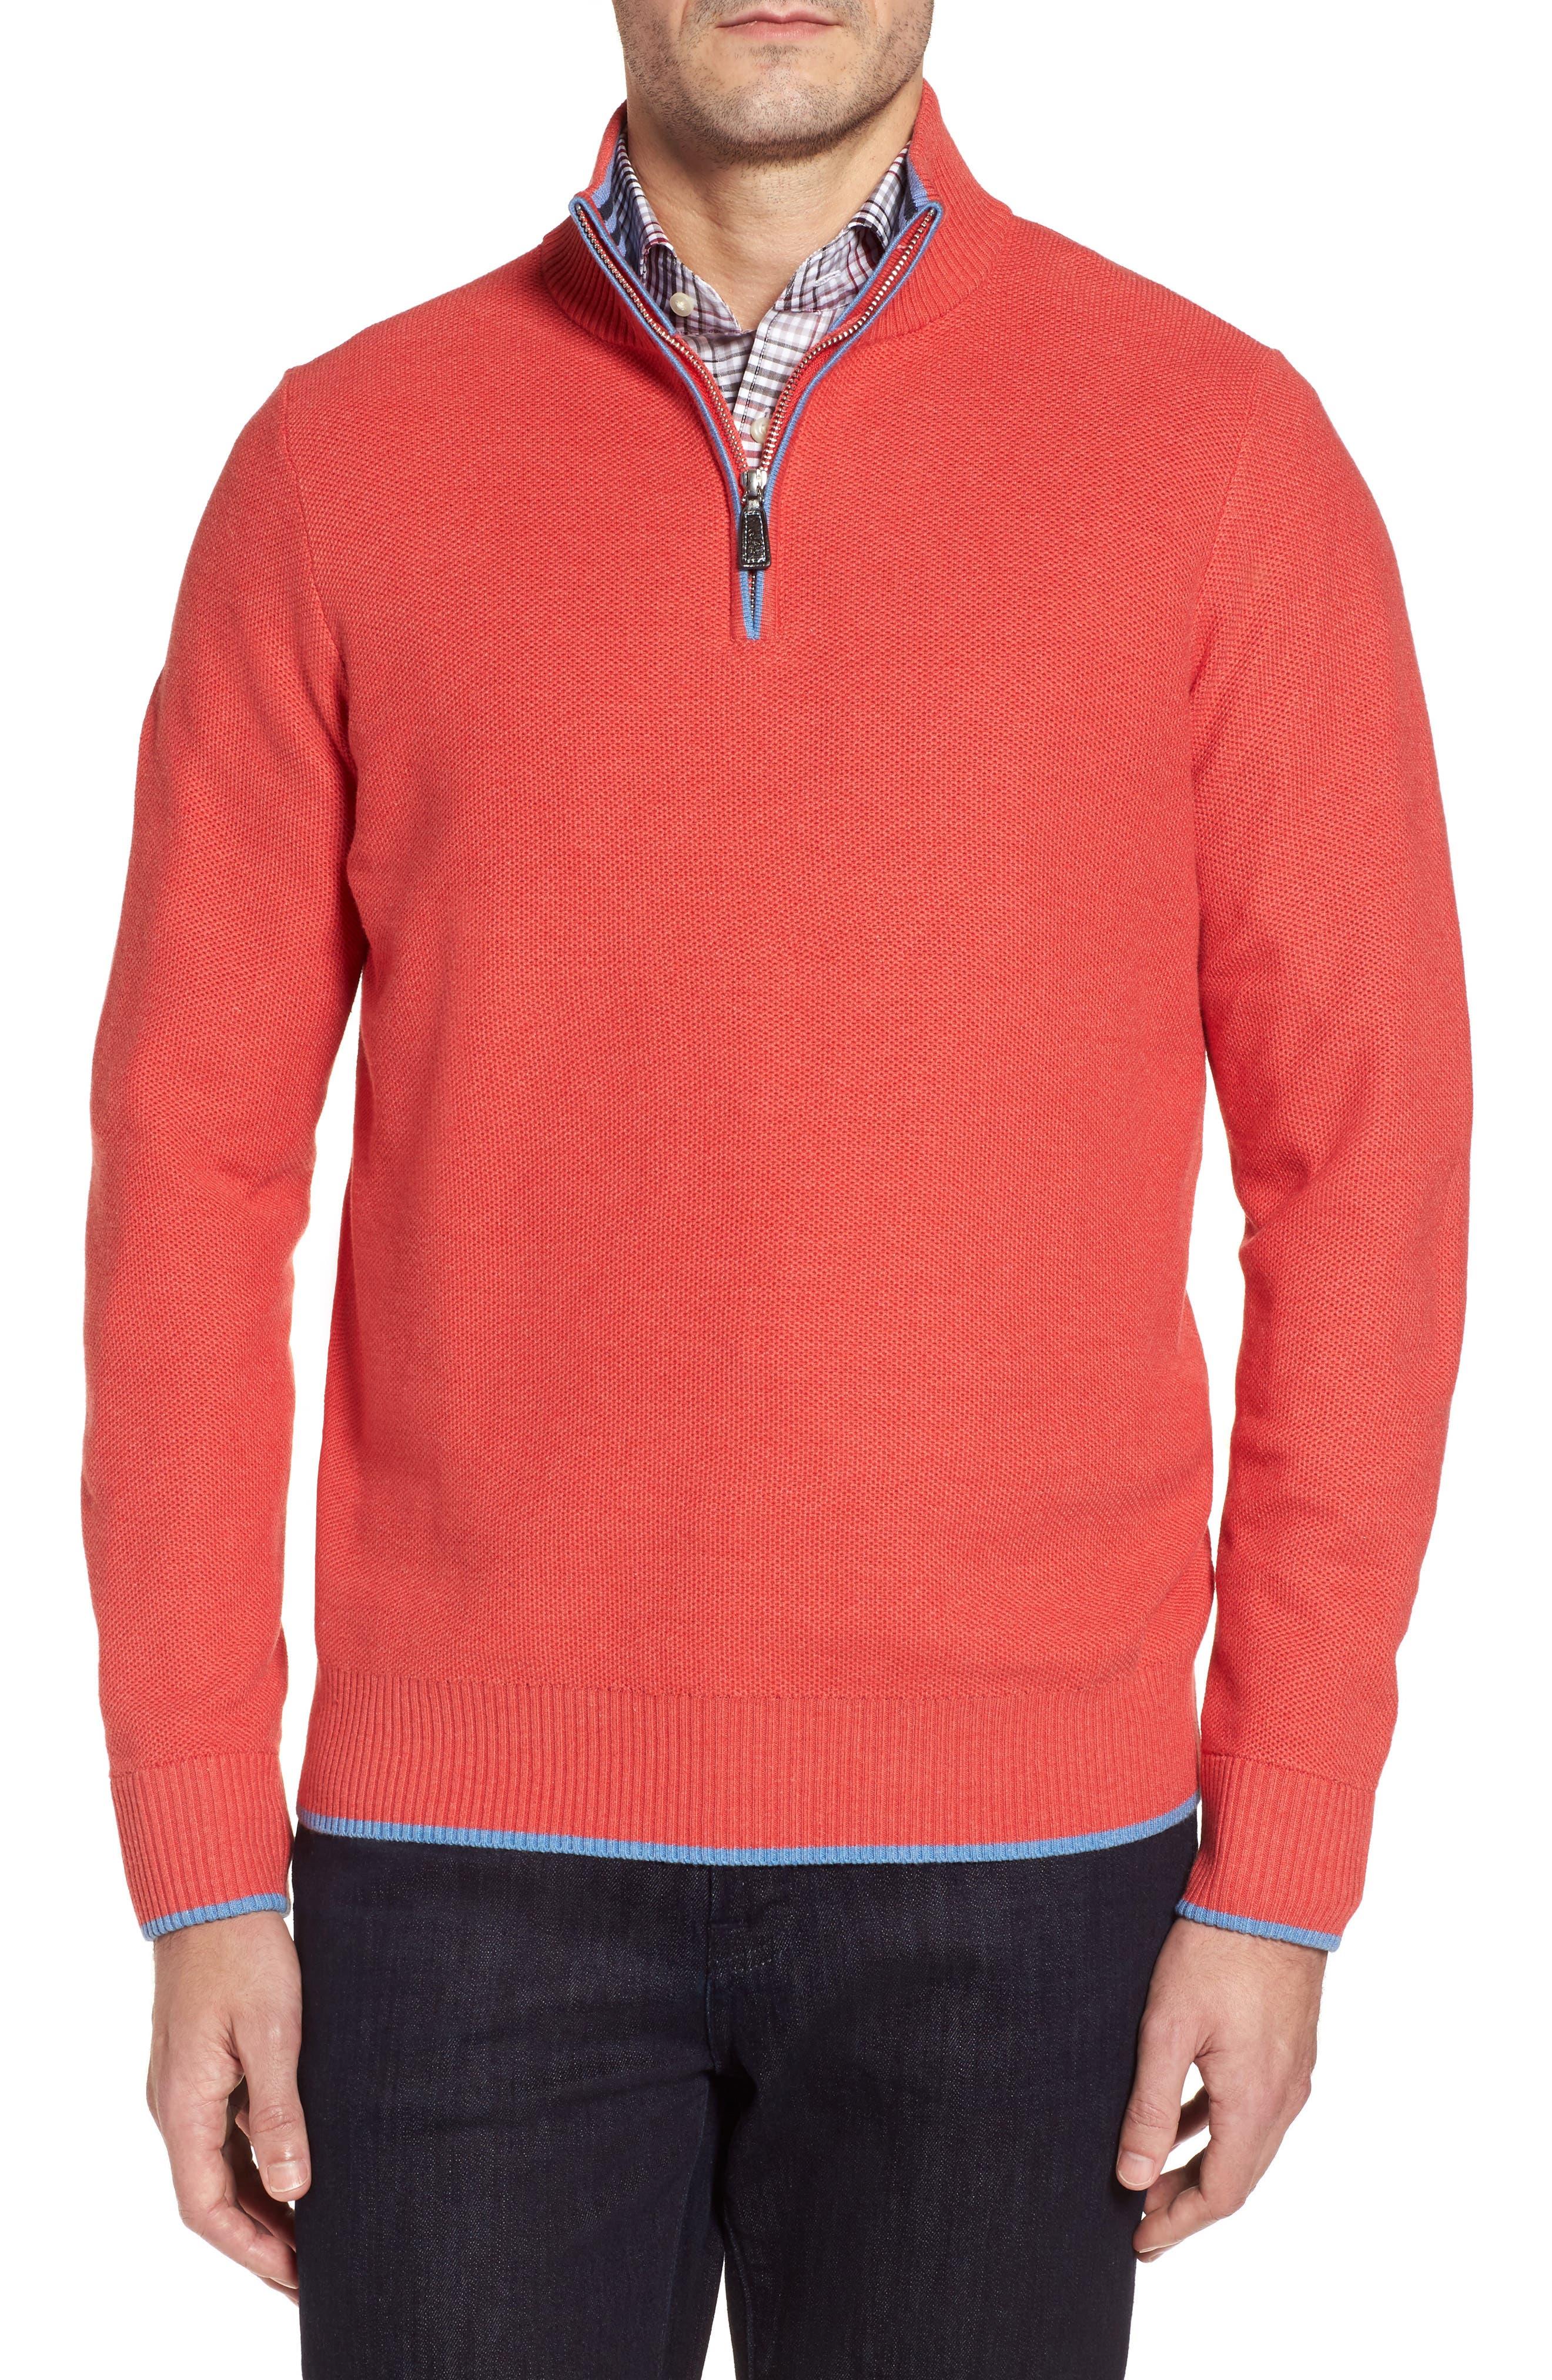 Sorrel Tipped Quarter Zip Sweater,                             Main thumbnail 1, color,                             950